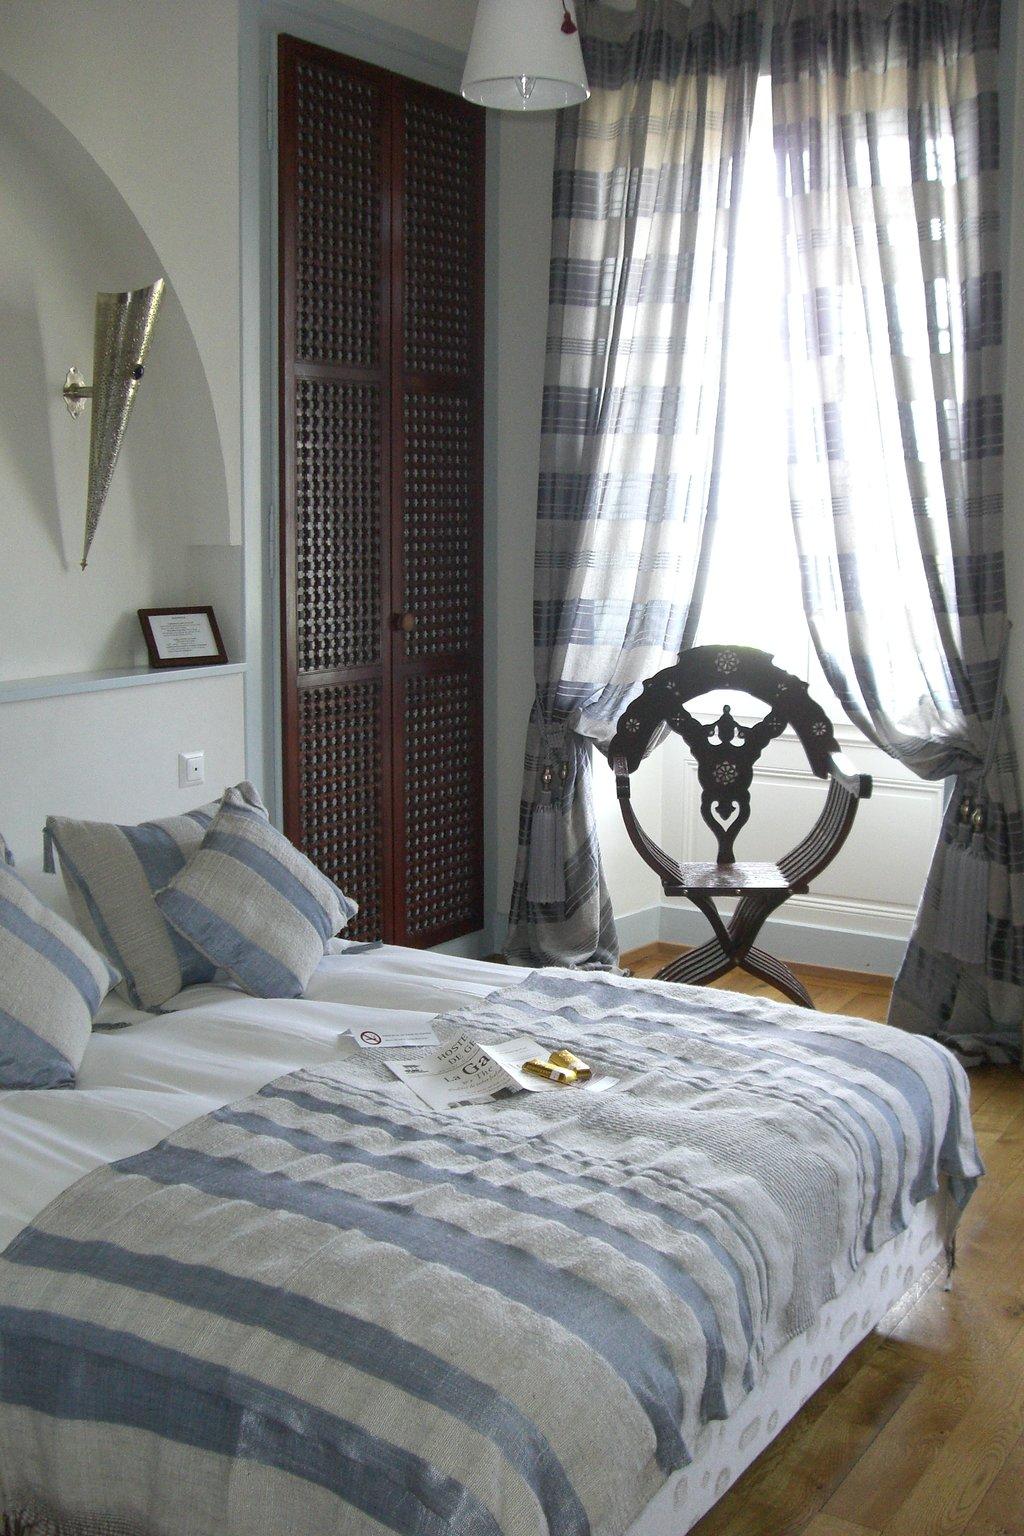 Hostellerie de Genève (Hôtel)